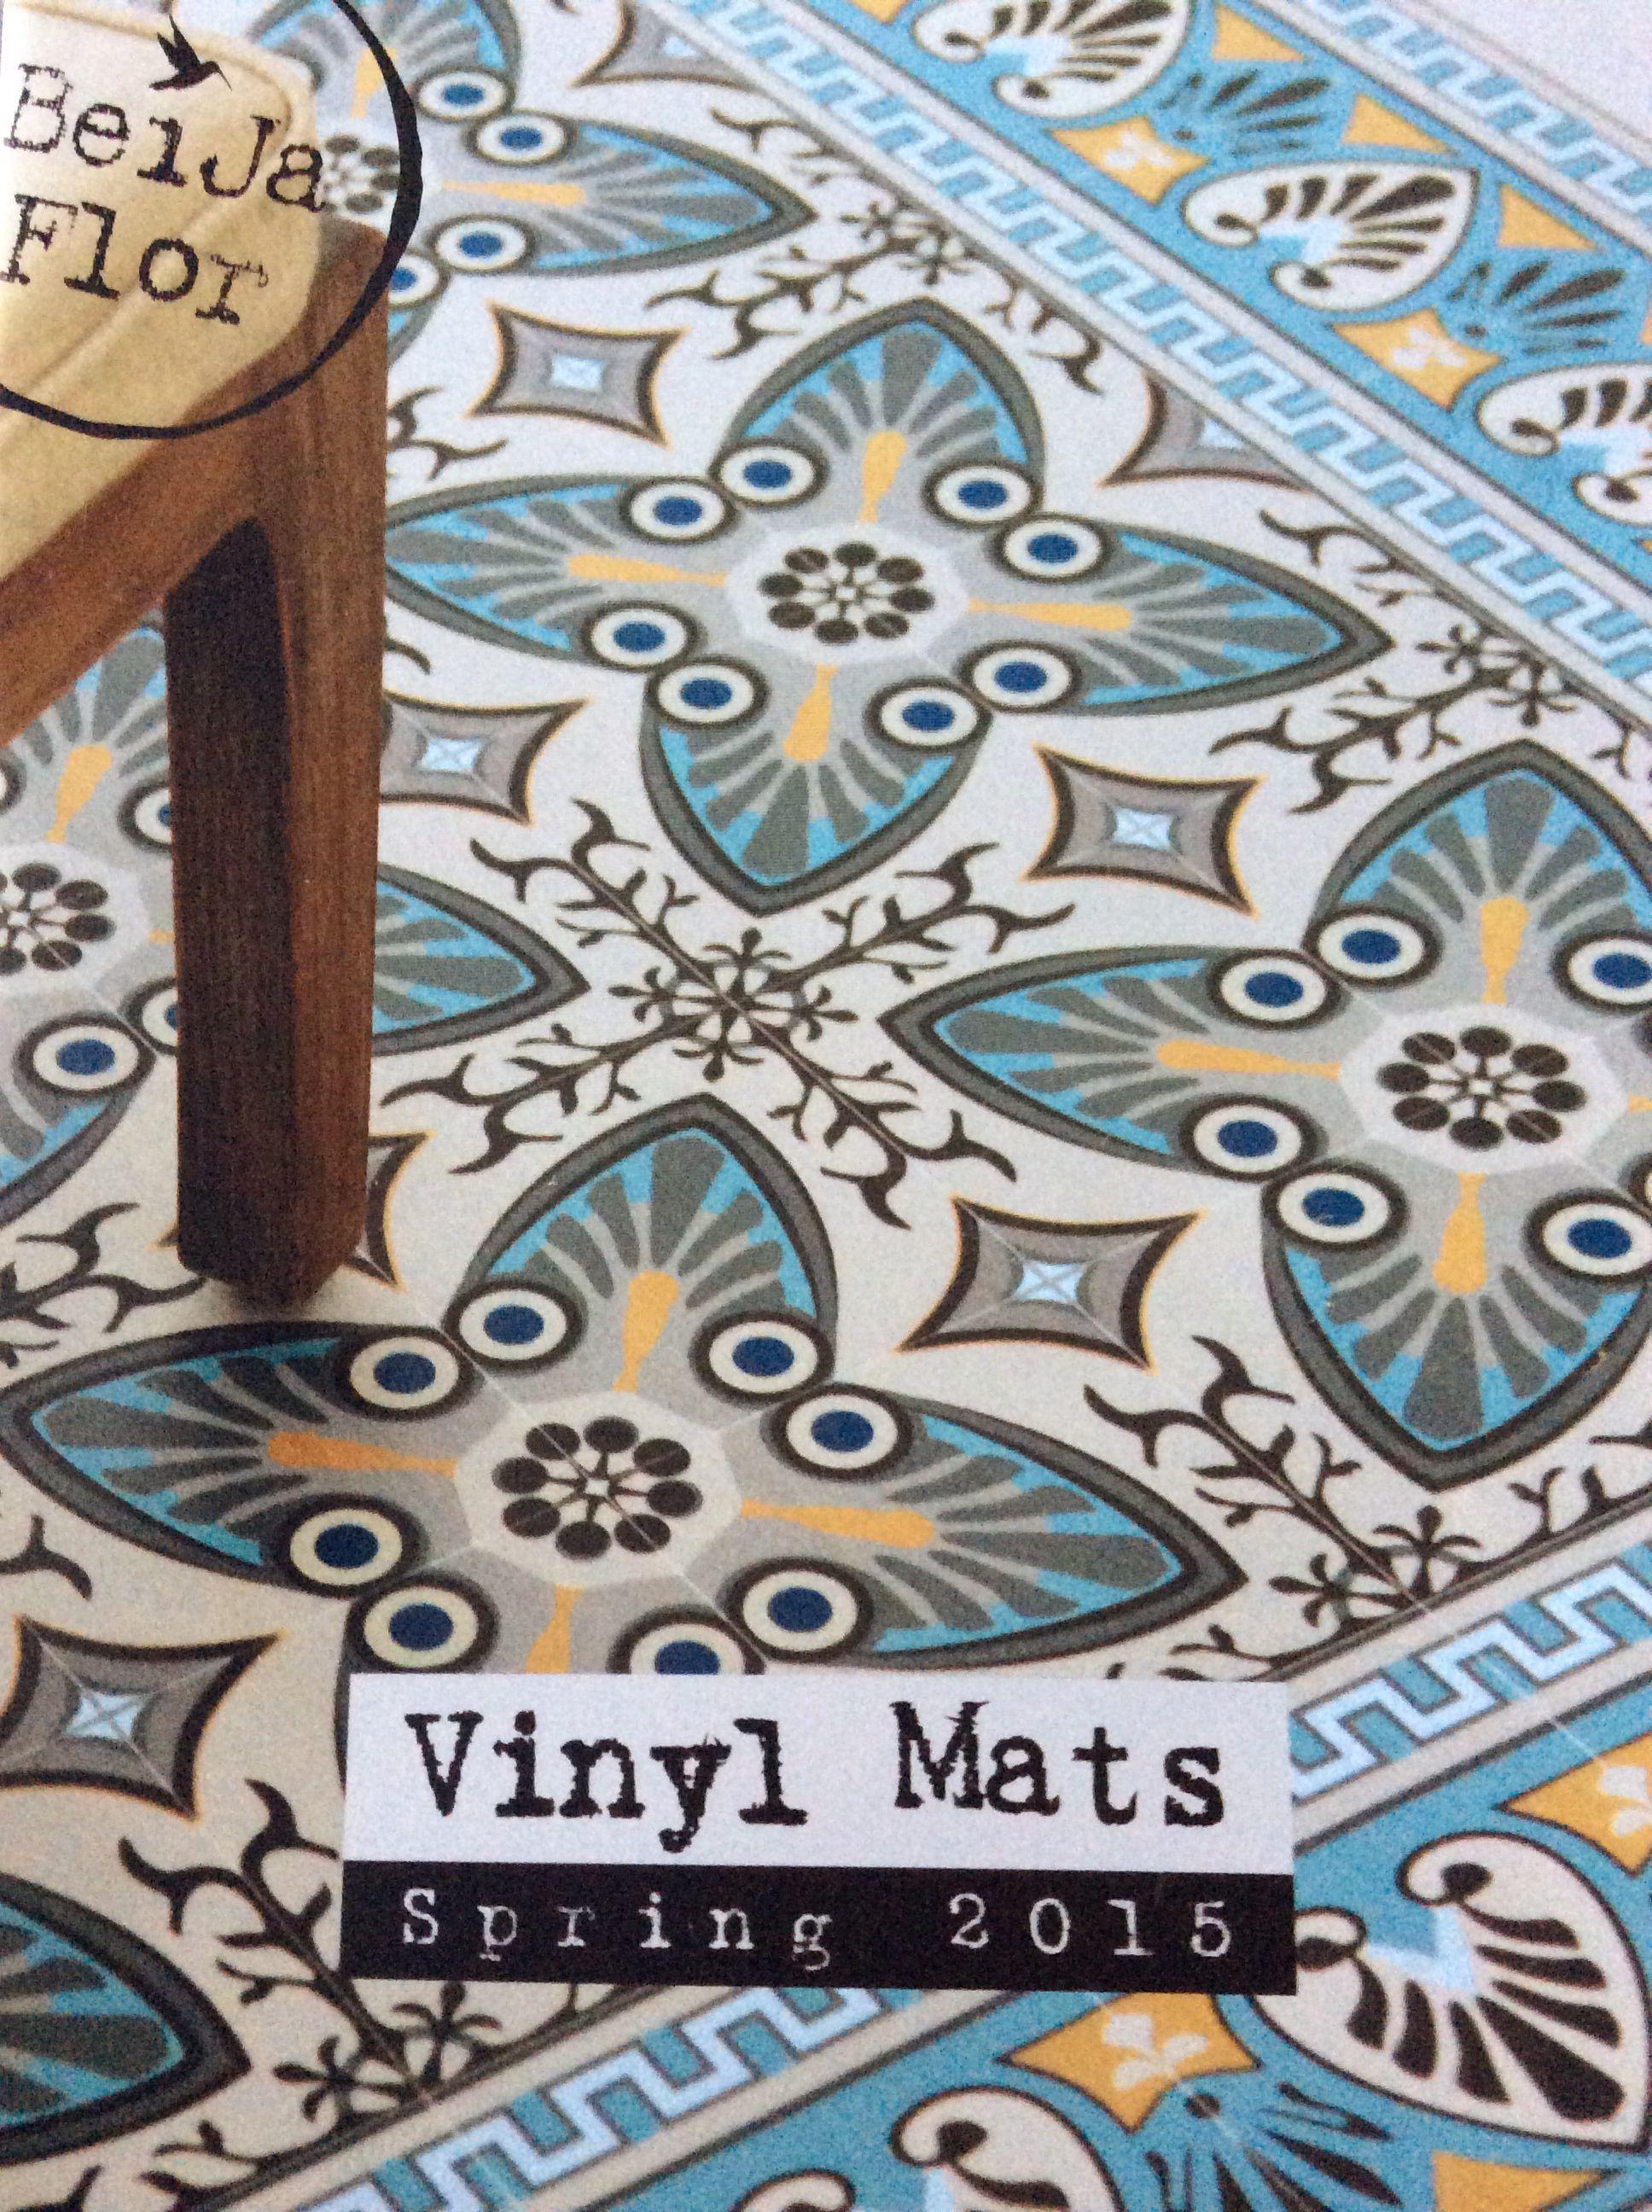 Beija Flor Beija Carpet Salon Maison Et Objet Janvier 2015 Tapis